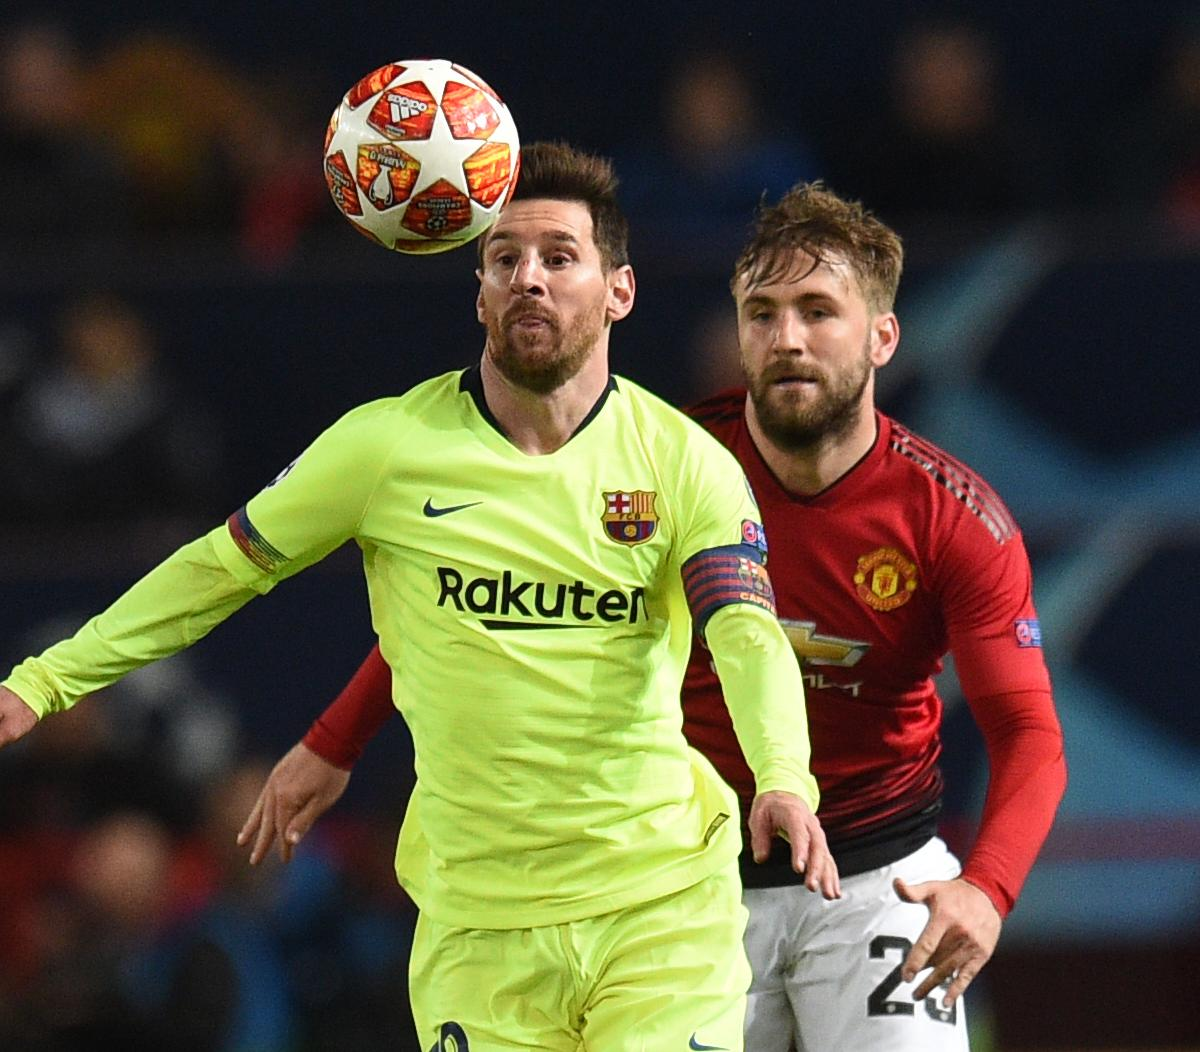 Champions League 2019 Round Of 16 Leg 2 Live Stream Tv: Barcelona Vs. Manchester United: Odds, Live Stream, TV